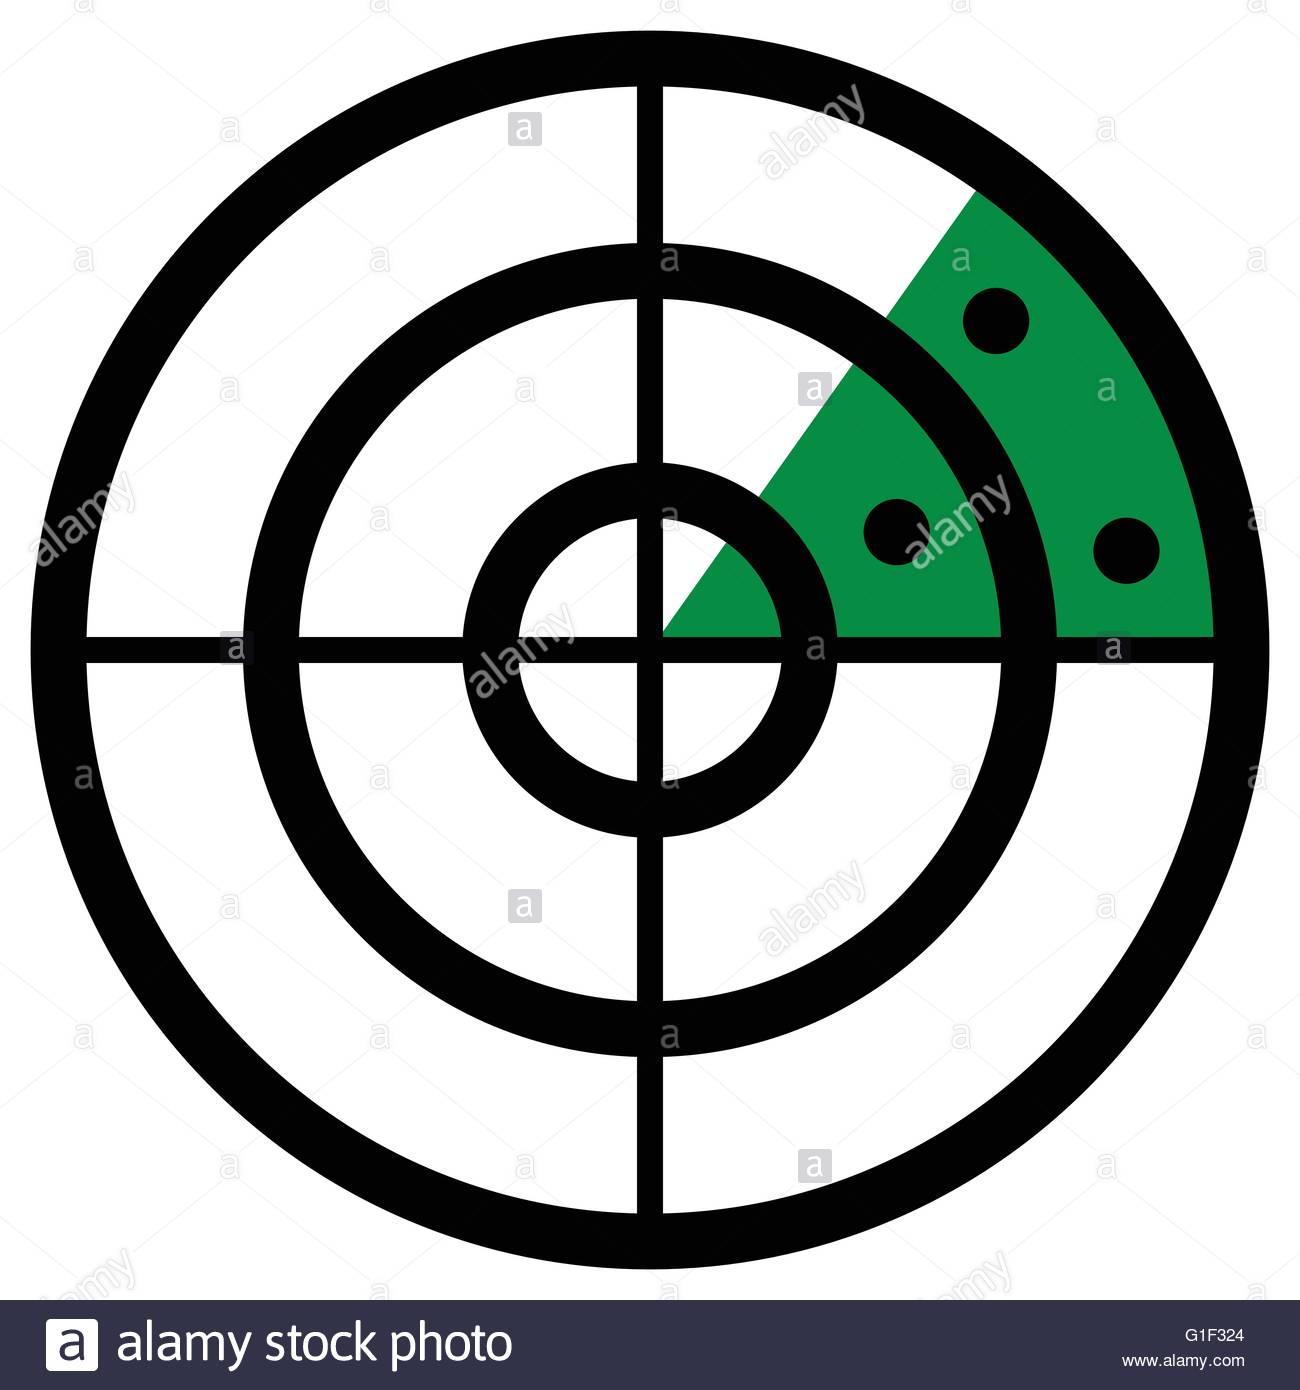 1300x1390 Radar Screen Symbol, Clip Art With Targets. Radar Icon Stock